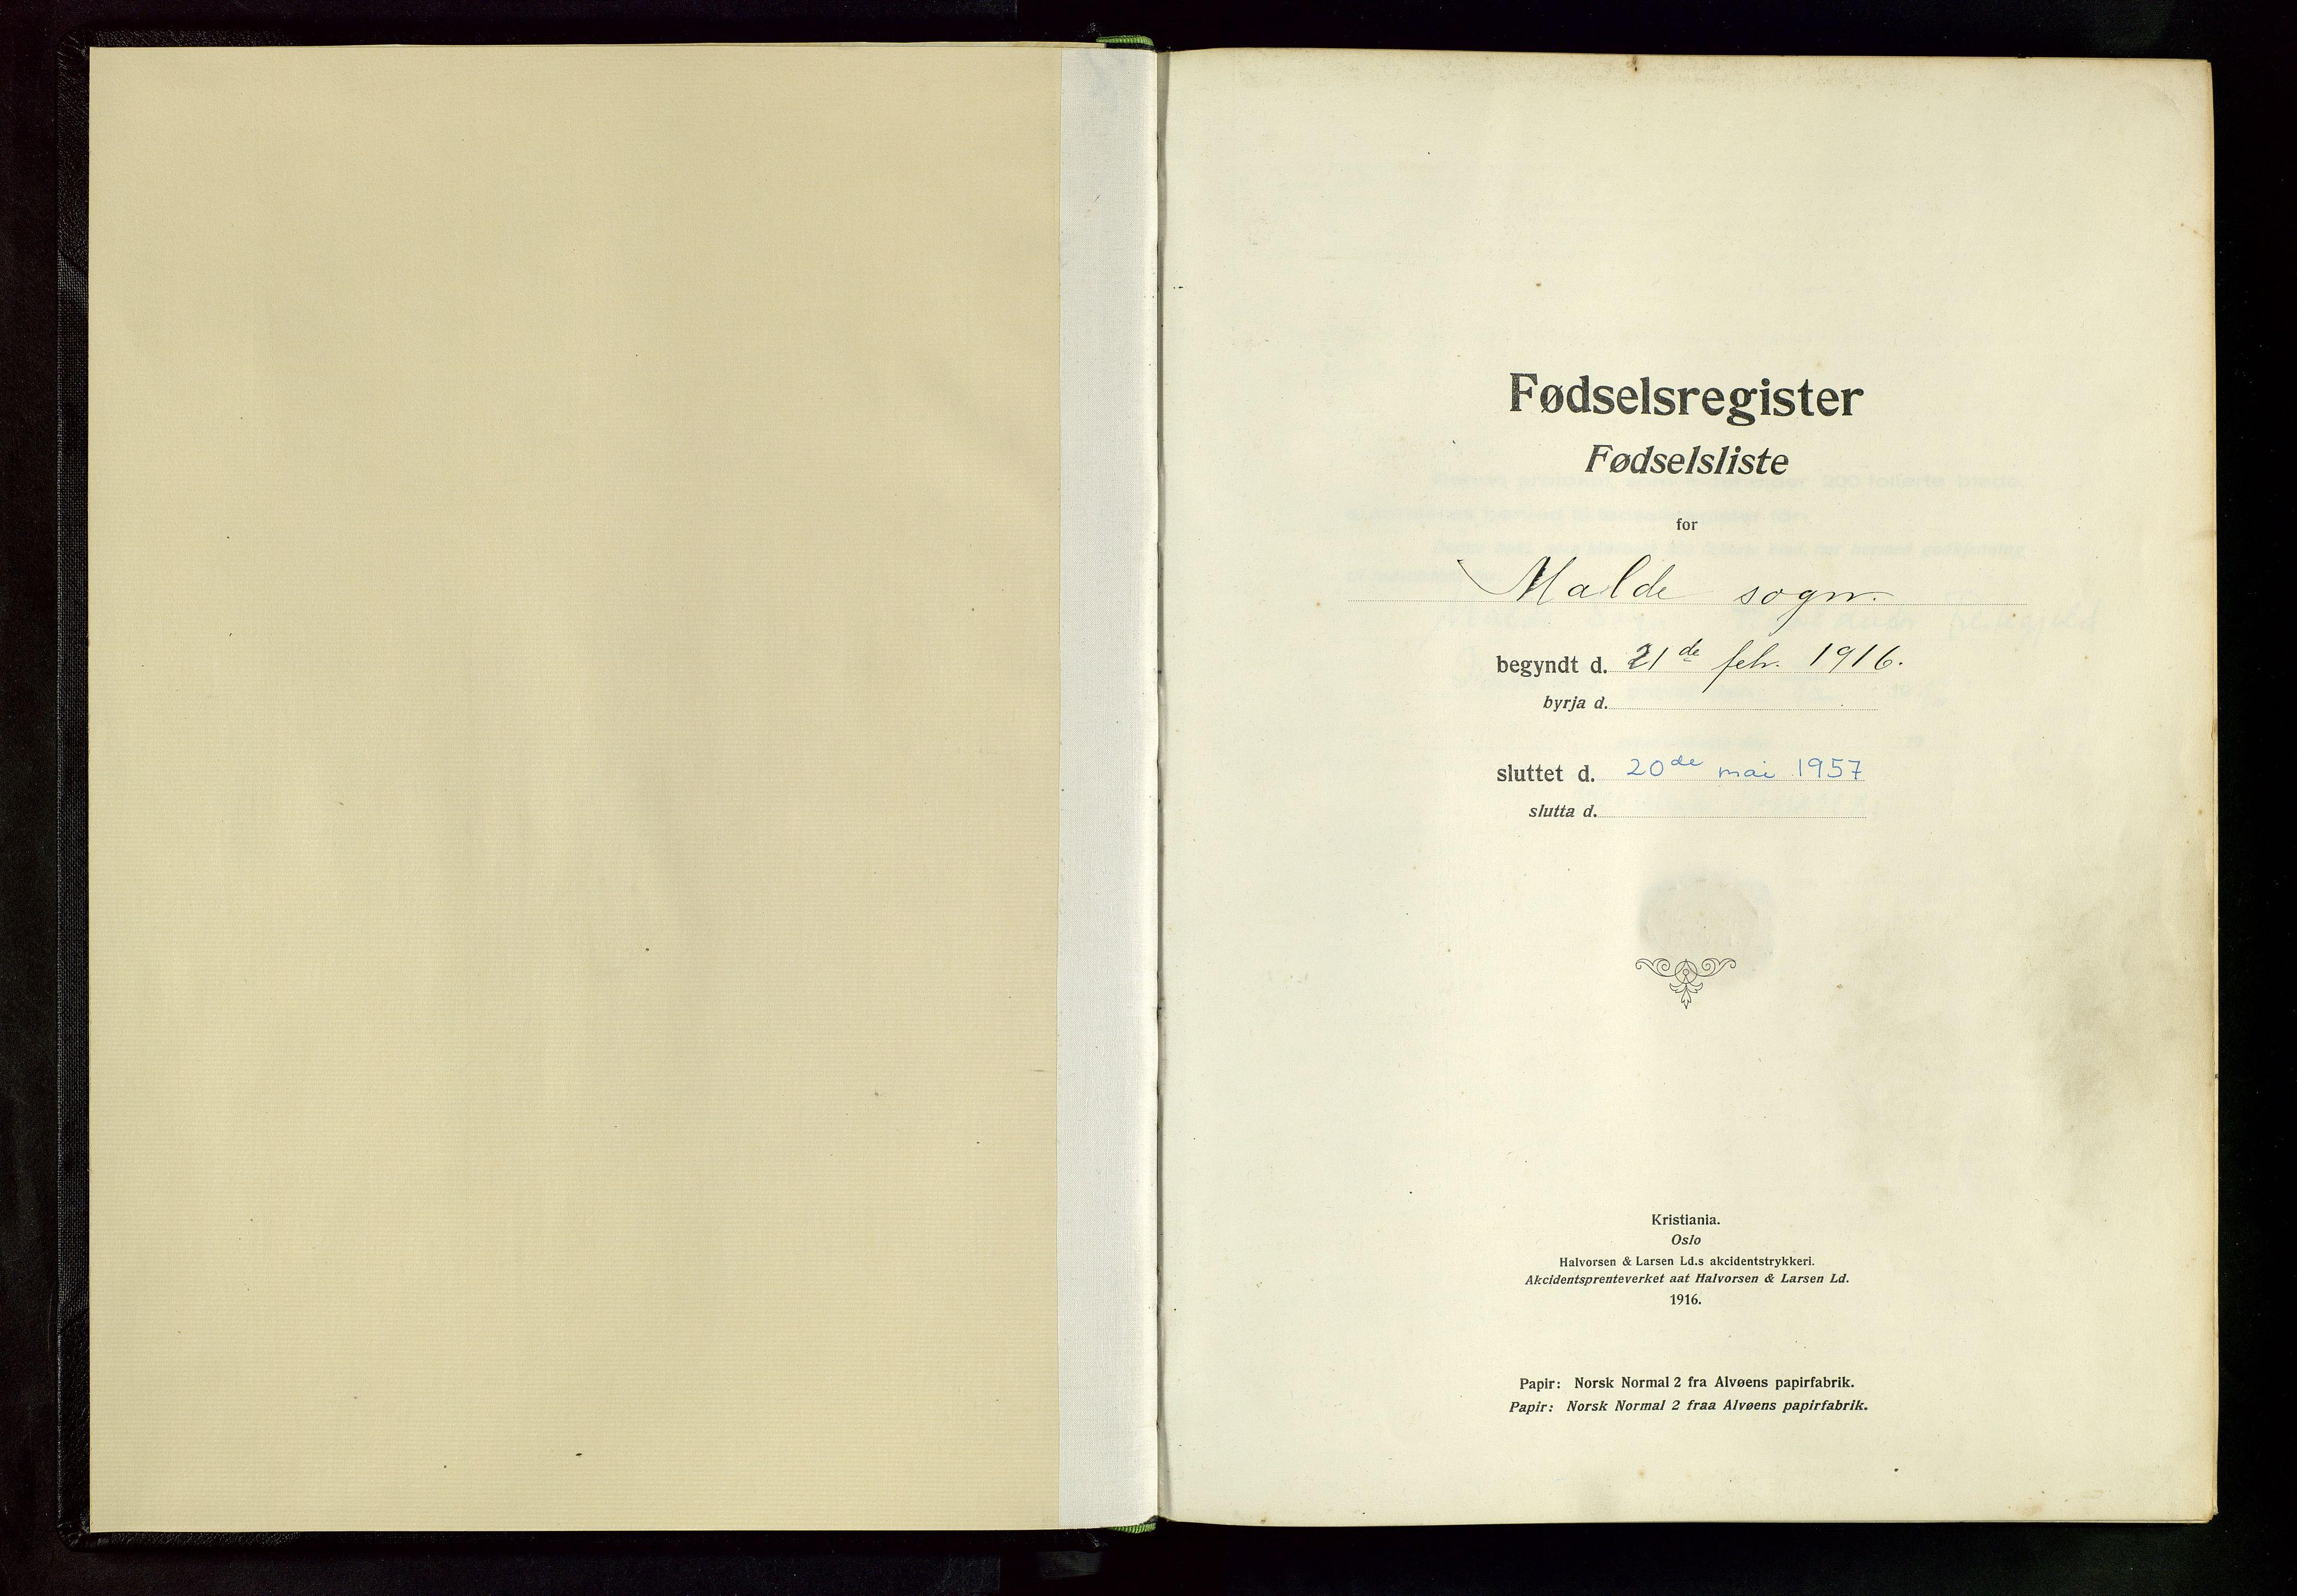 SAST, Håland sokneprestkontor, A/L0005: Fødselsregister nr. 5, 1916-1957